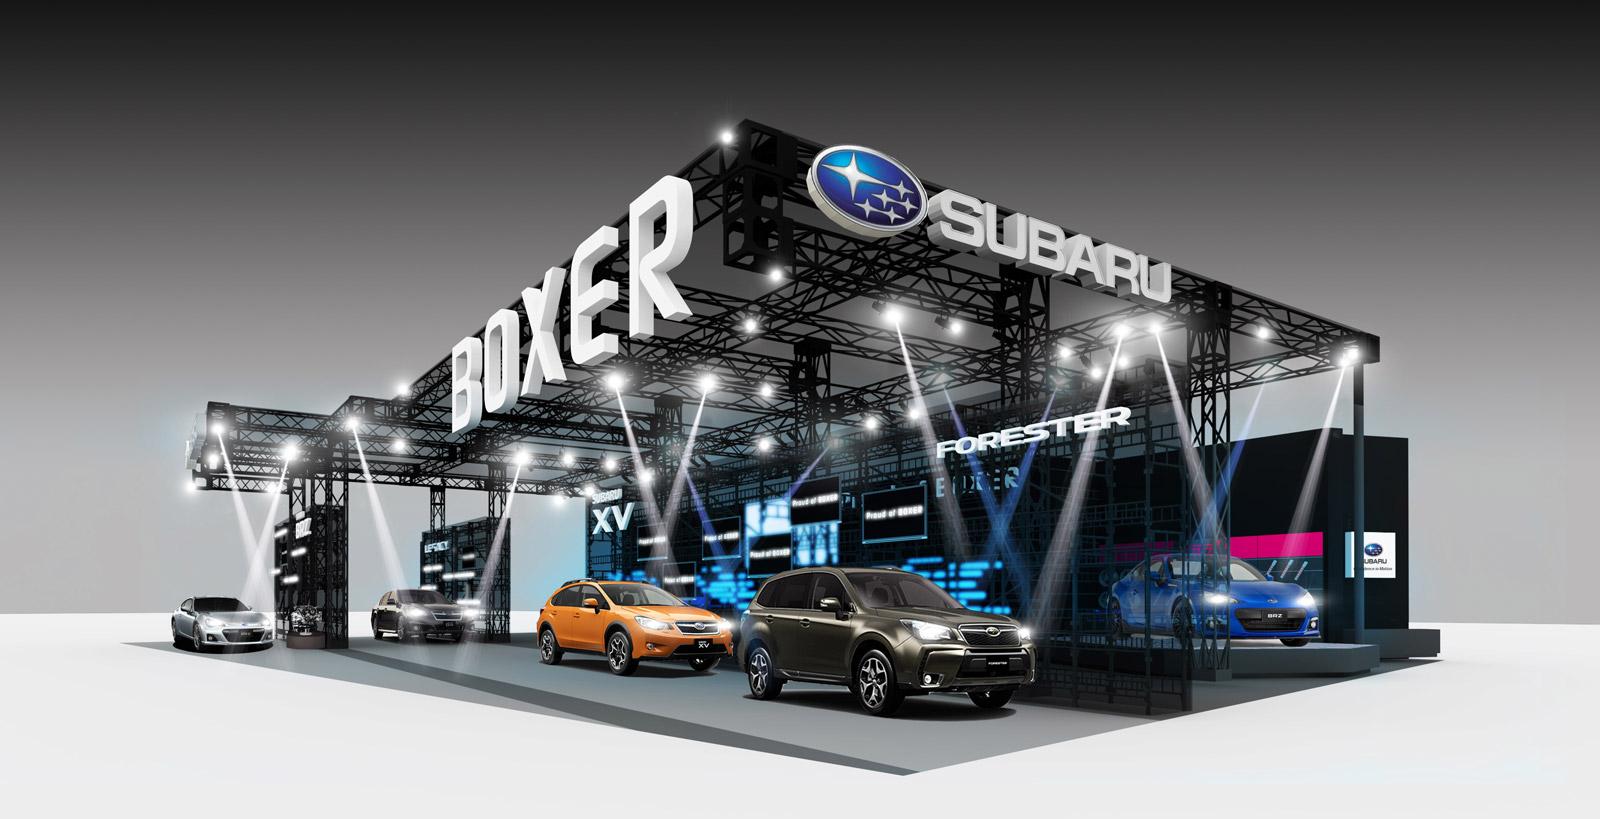 Subaru previews 2013 tokyo auto salon lineup for 2013 tokyo auto salon